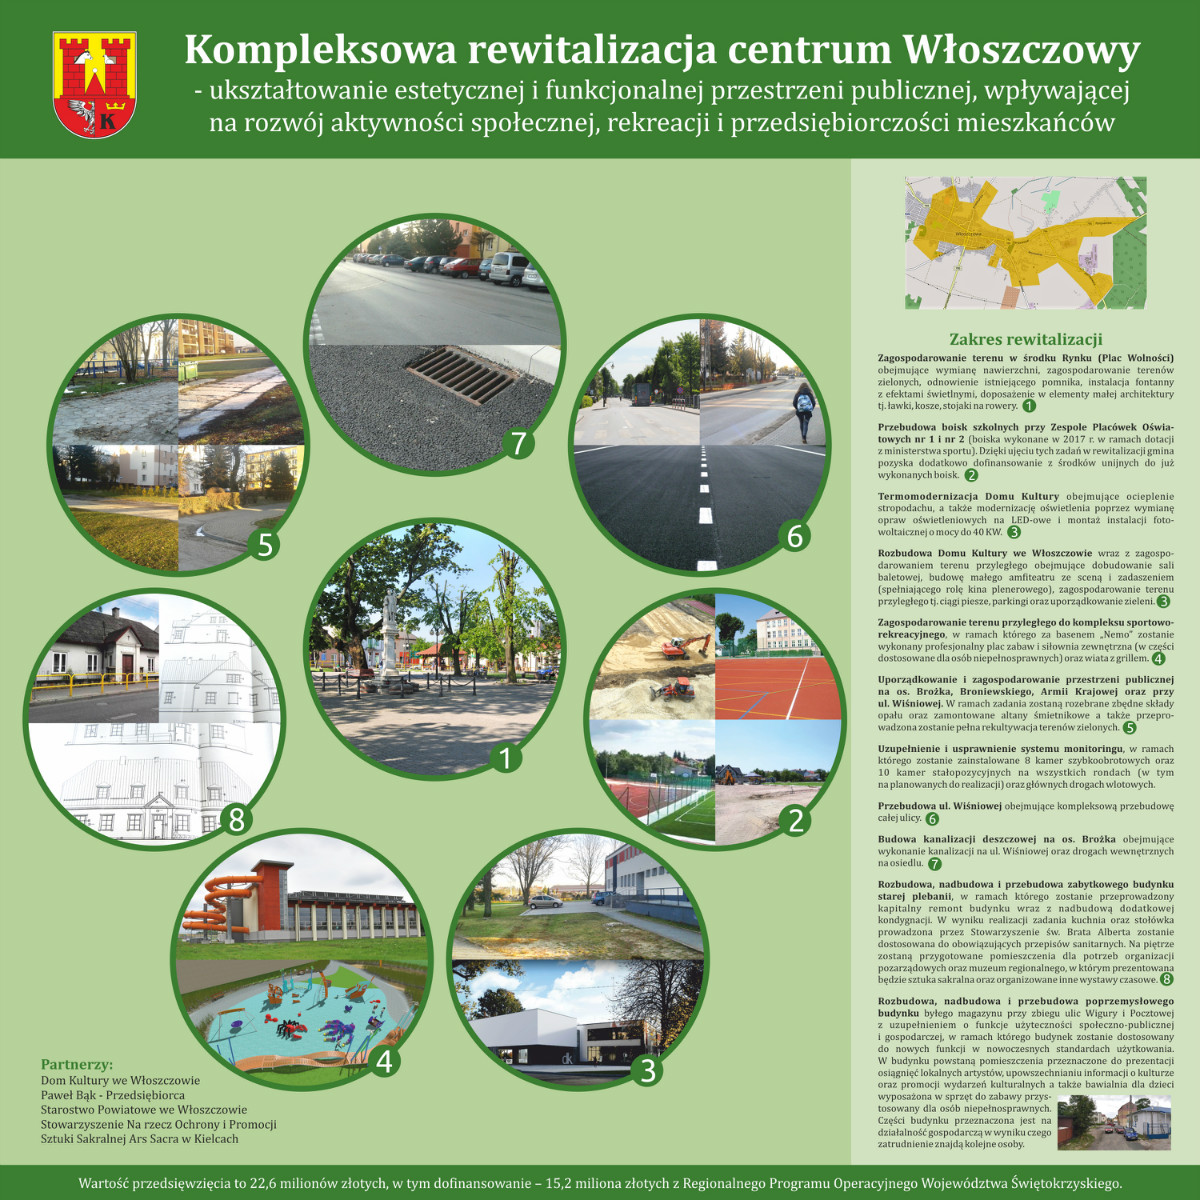 fot.wloszczowa.pl